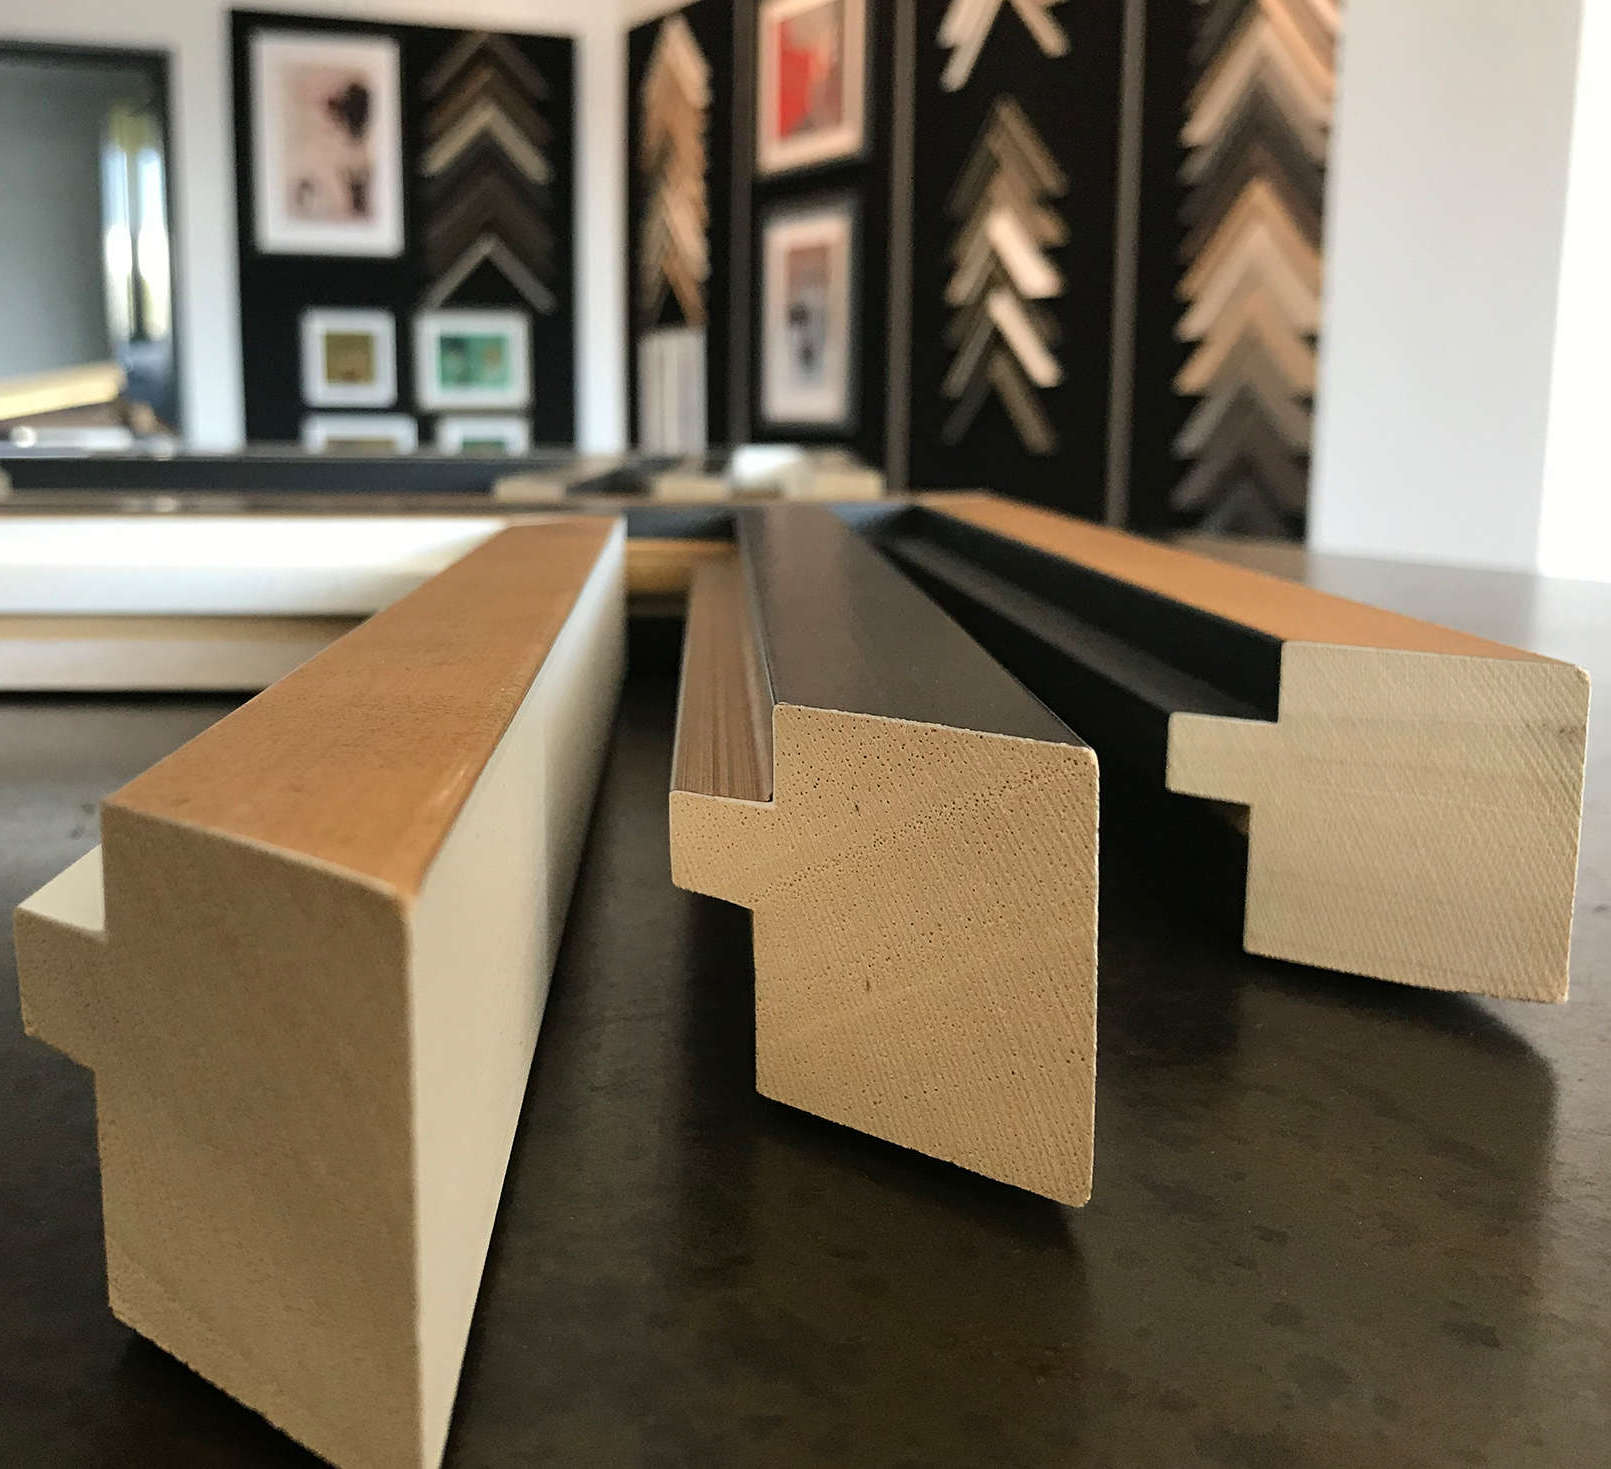 Rosini Cornici Company - Artisanal Italian Frame Moulding